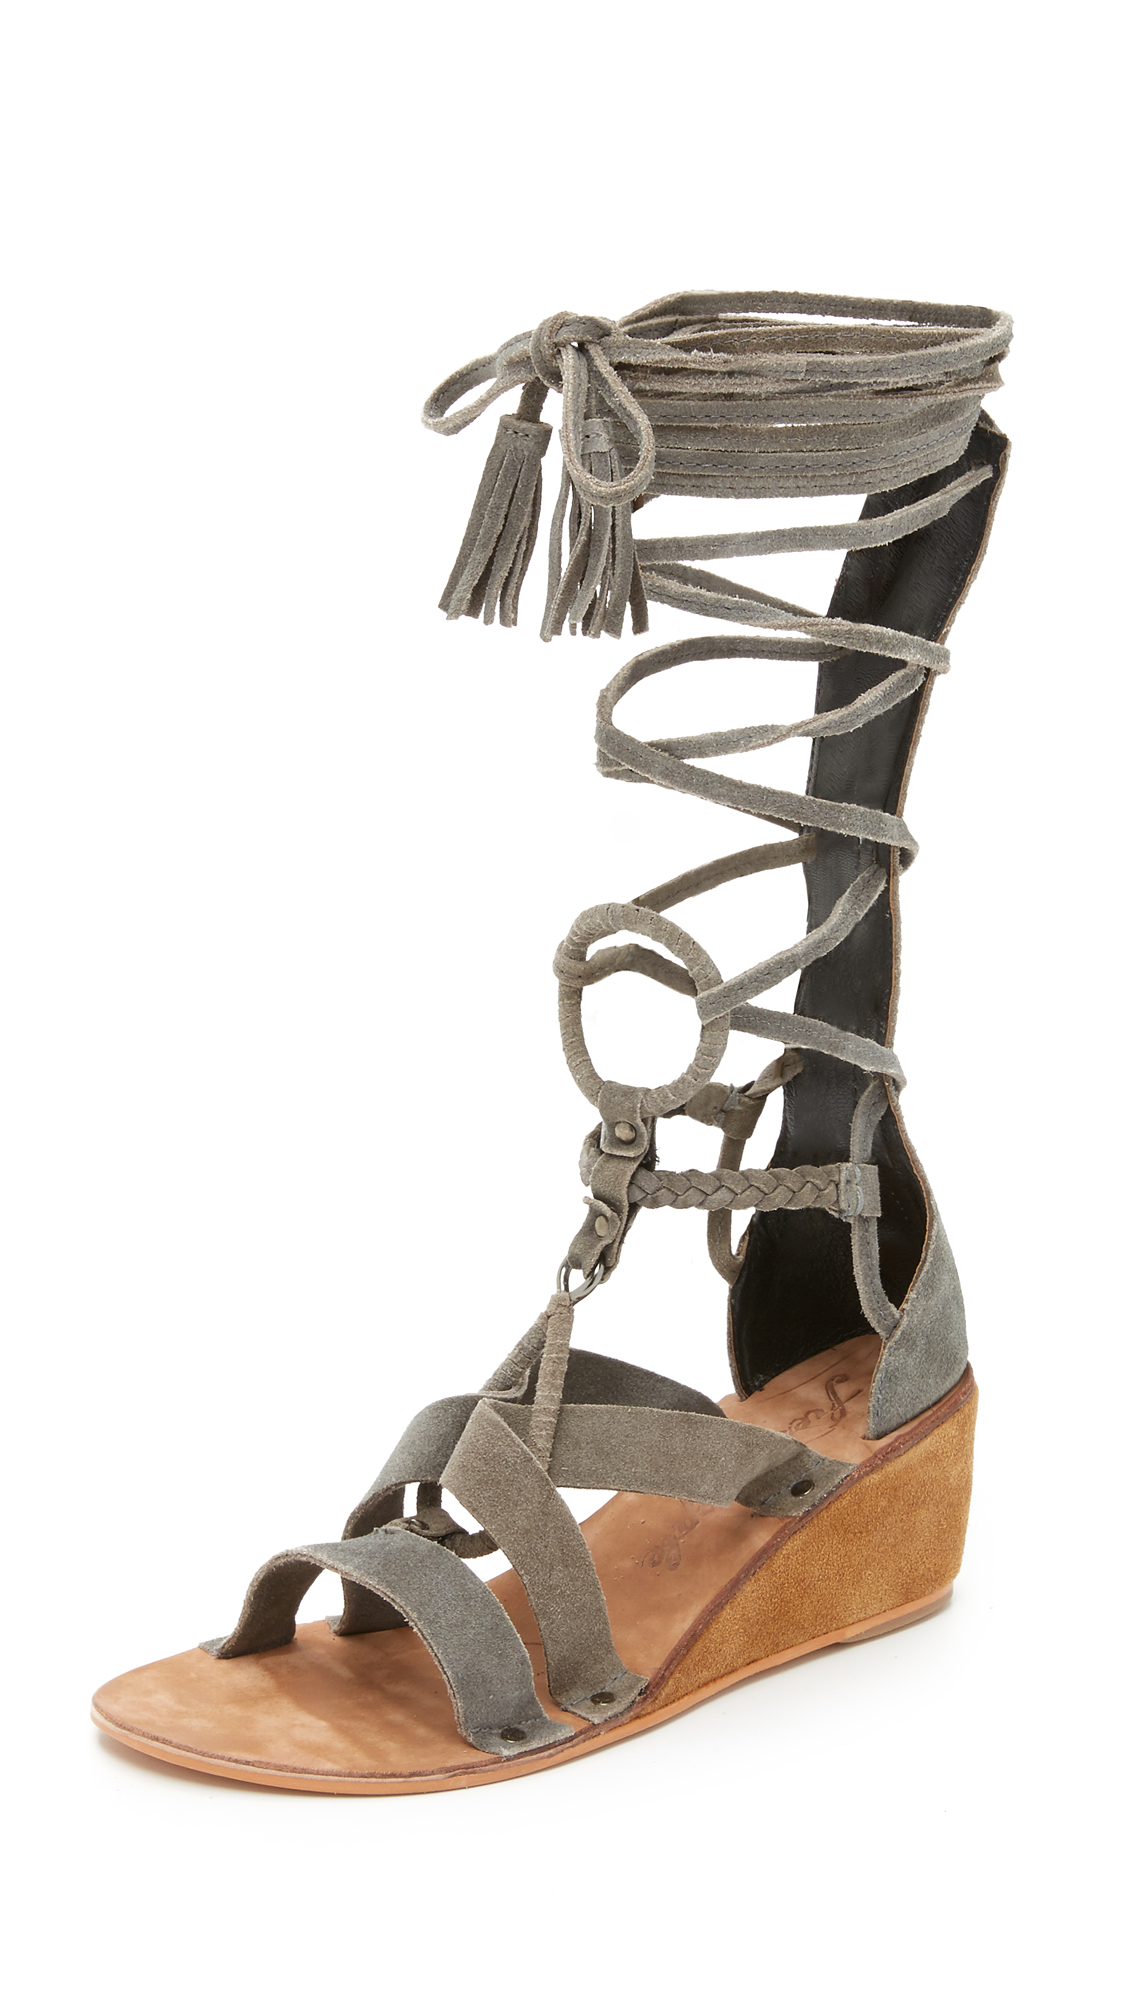 20c70249b74 Lyst - Free People Saltarello Mini Wedge Gladiator Sandals in Gray